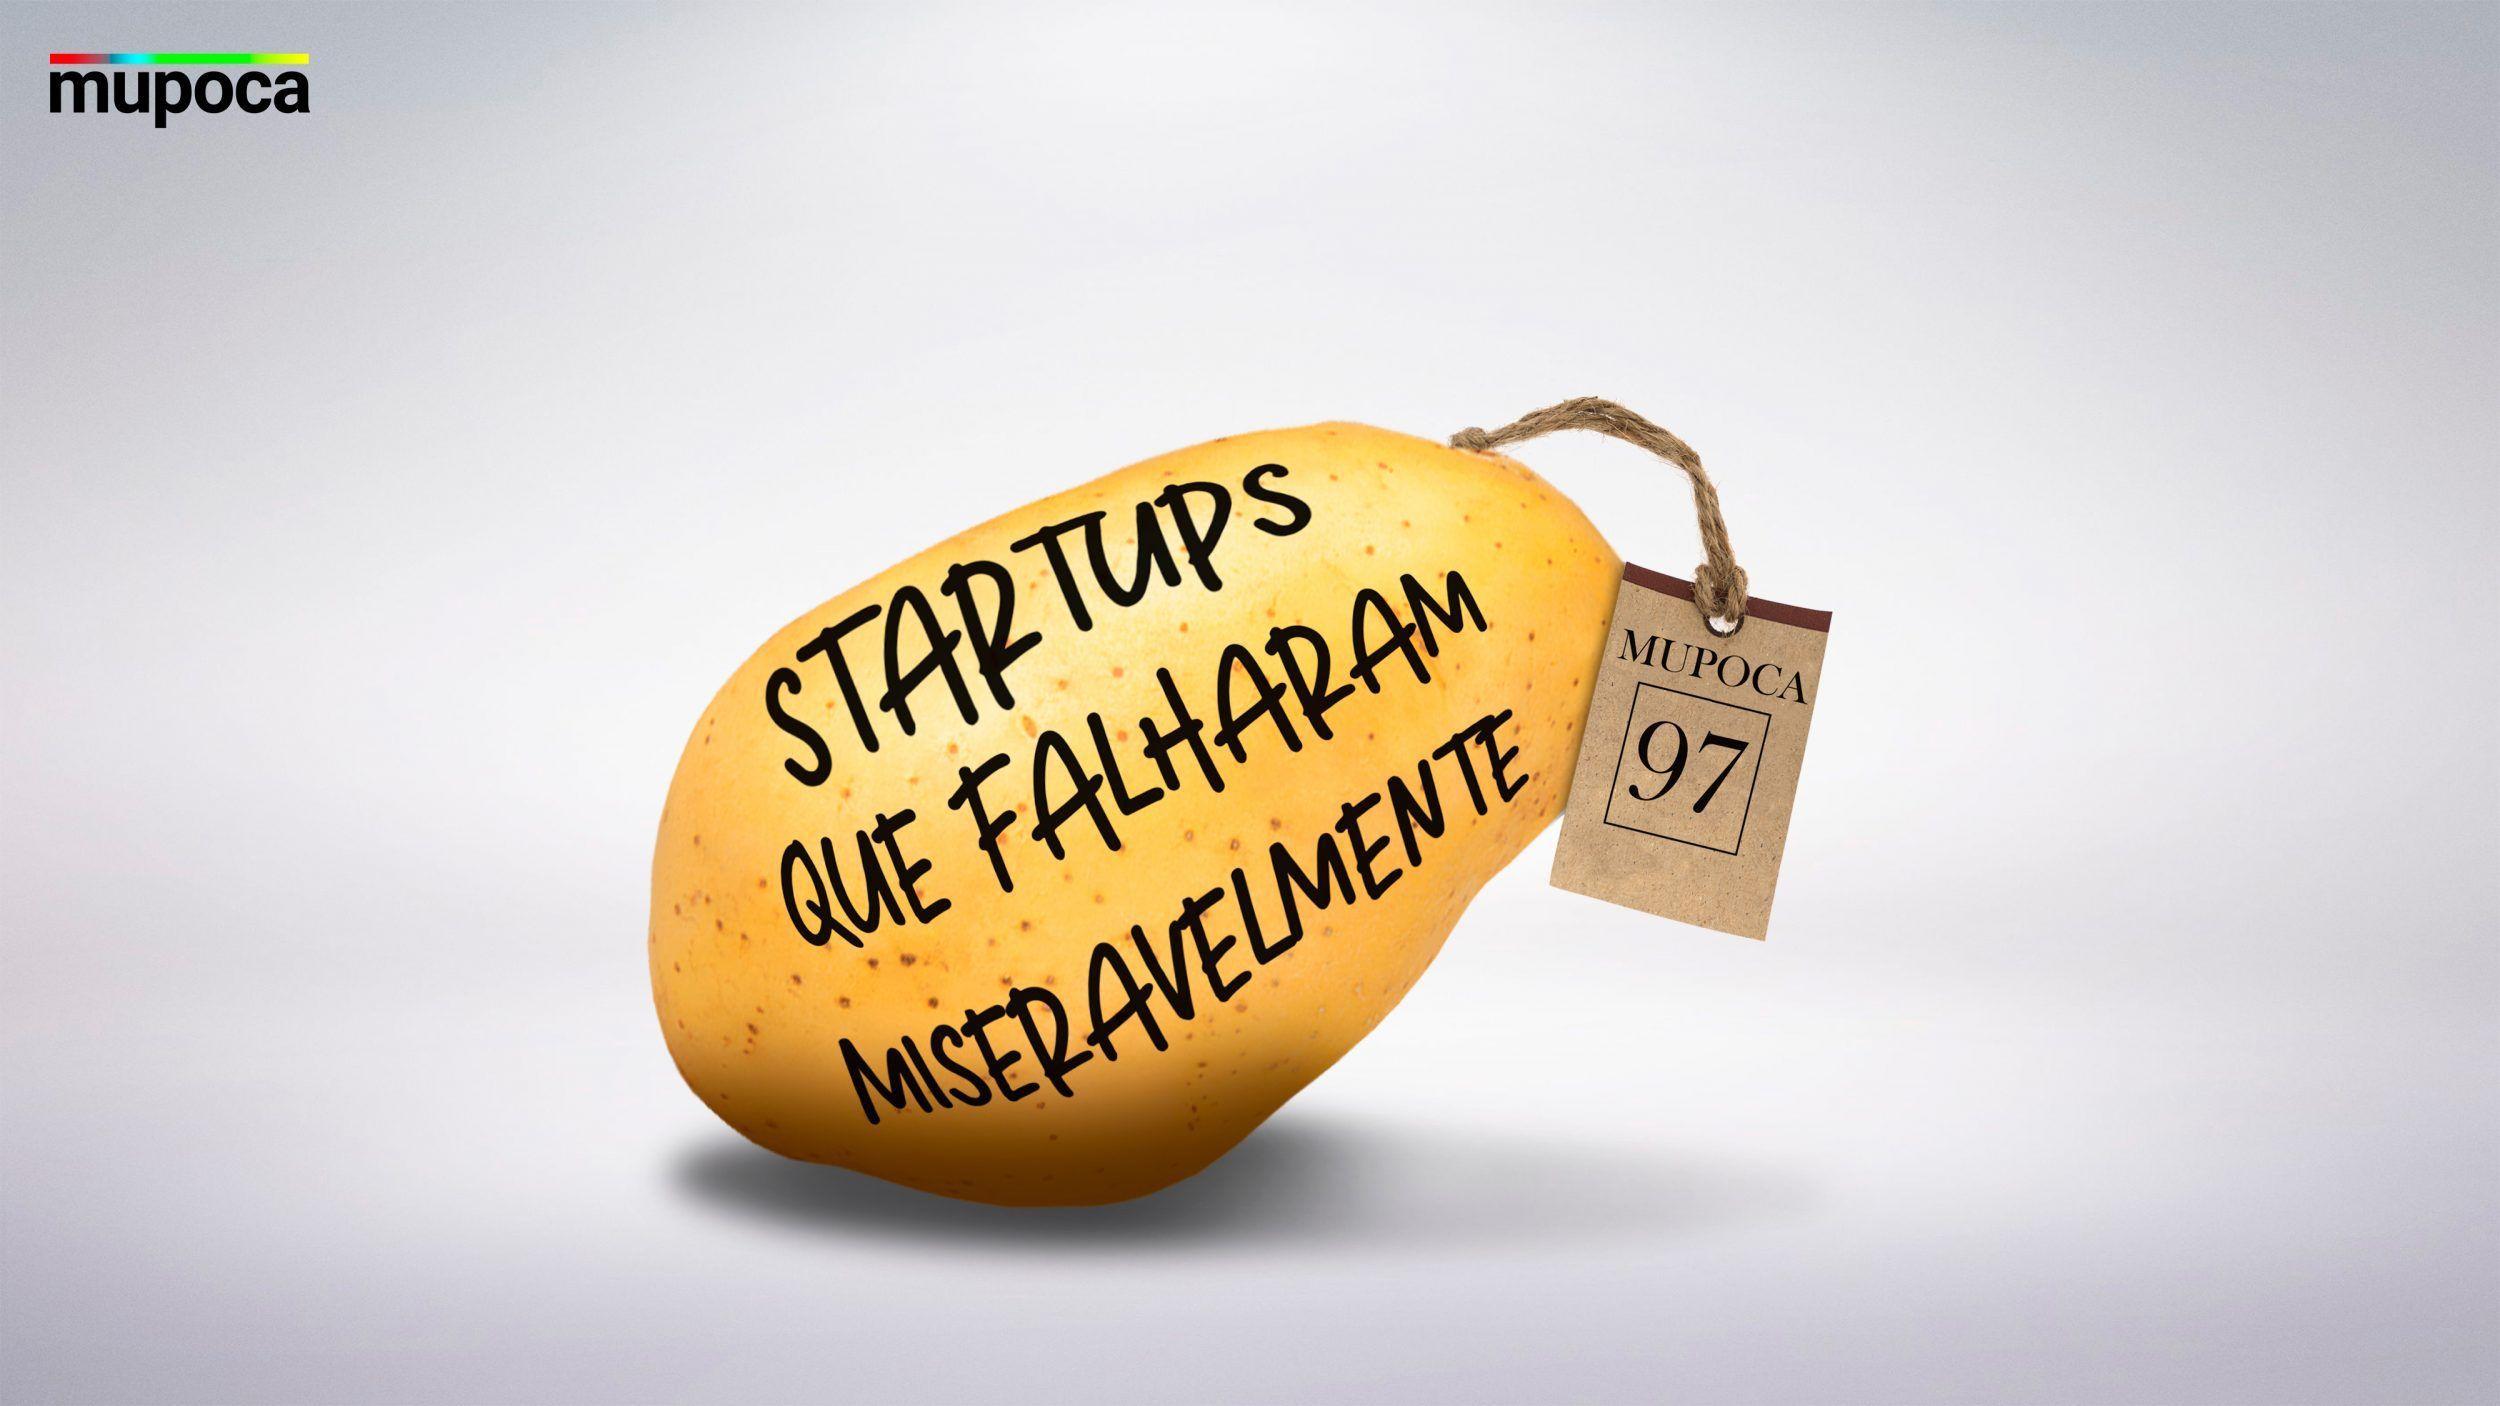 Capa ilustrativa do Mupoca 97 - Startups que falharam miseravelmente